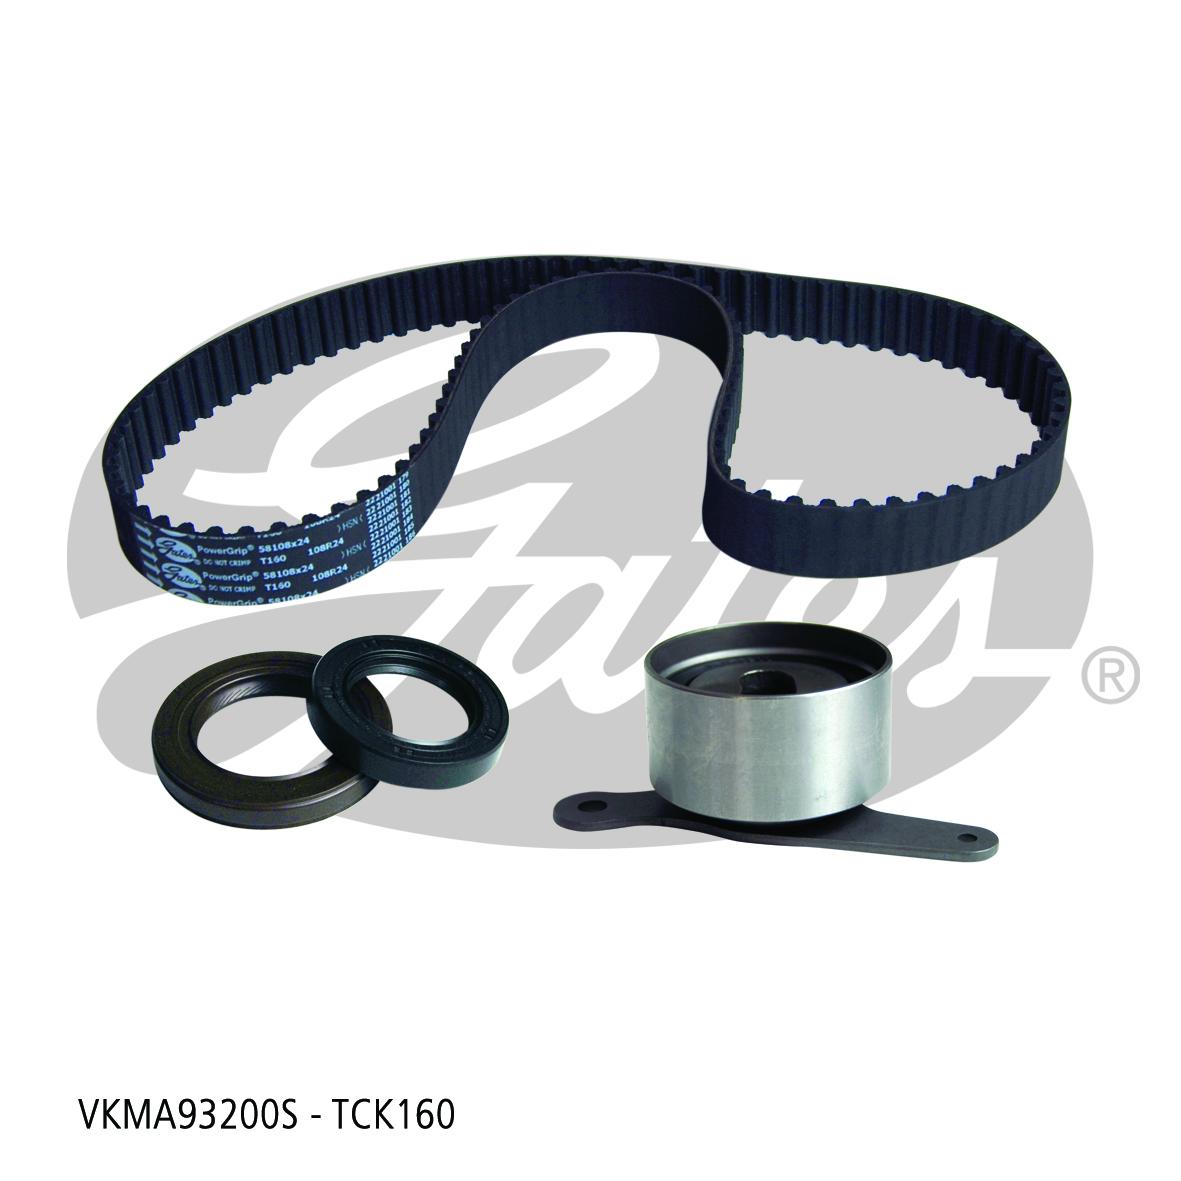 New Gates Timing Belt Kit TCK160 fits Honda Accord 1.8 EX (AD), 2.0 EX (CA5),...